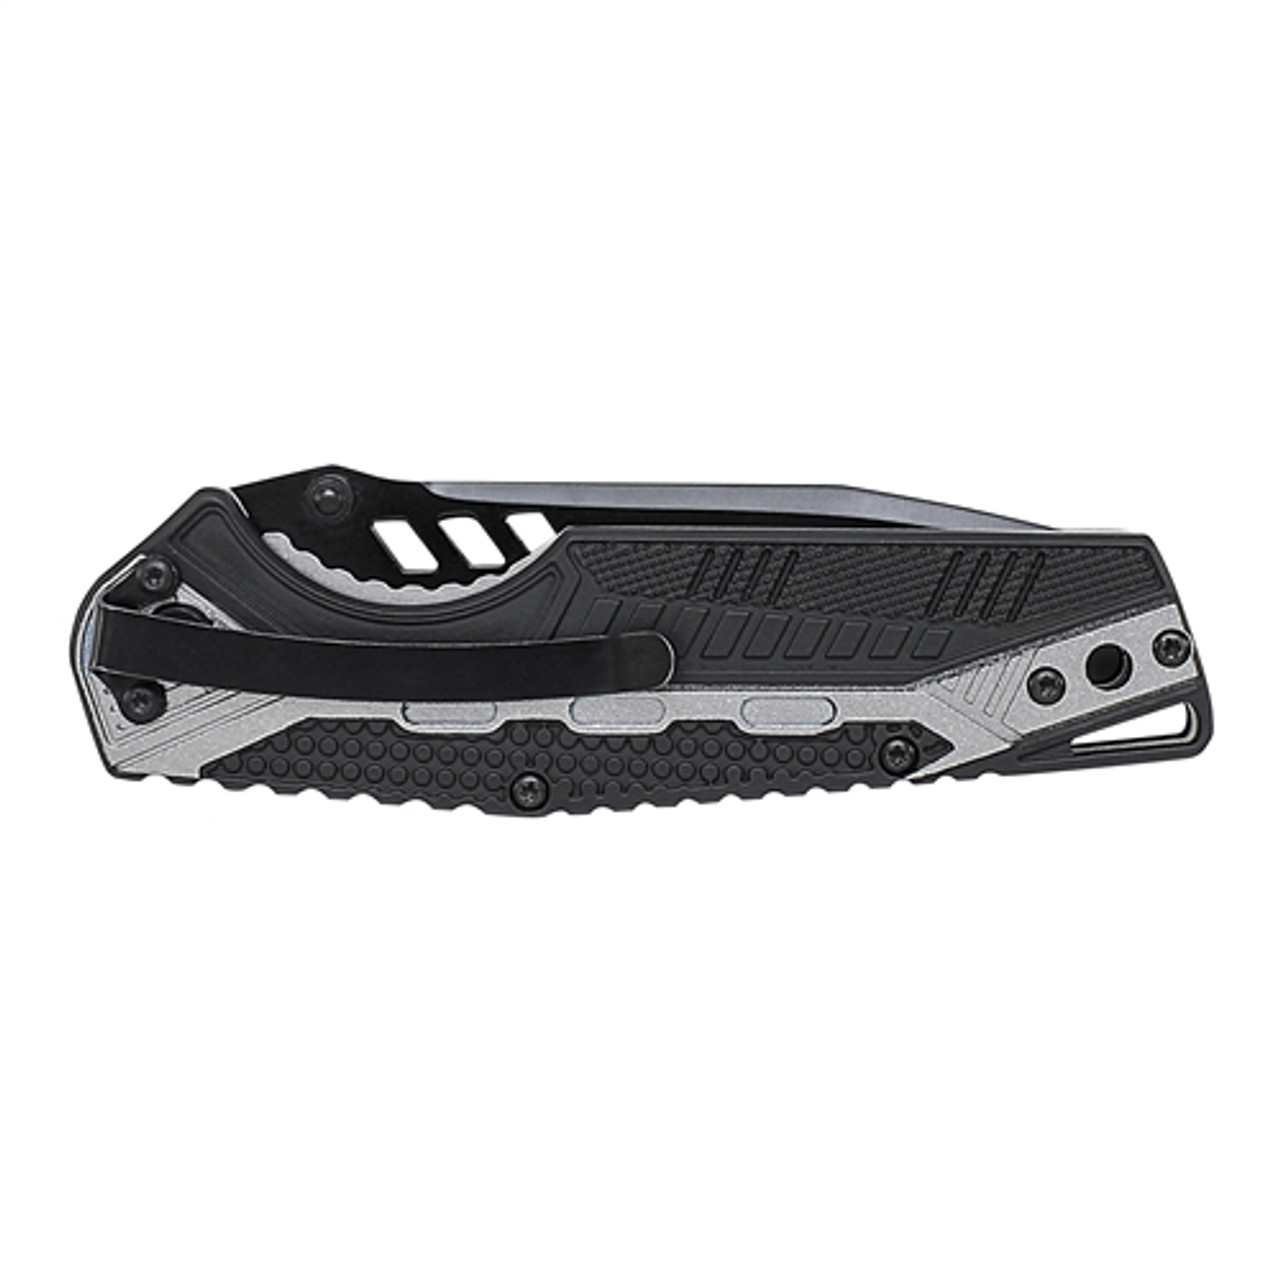 Smith & Wesson SW612S Black/Grey Tanto Folder Knife, Black Combo Blade